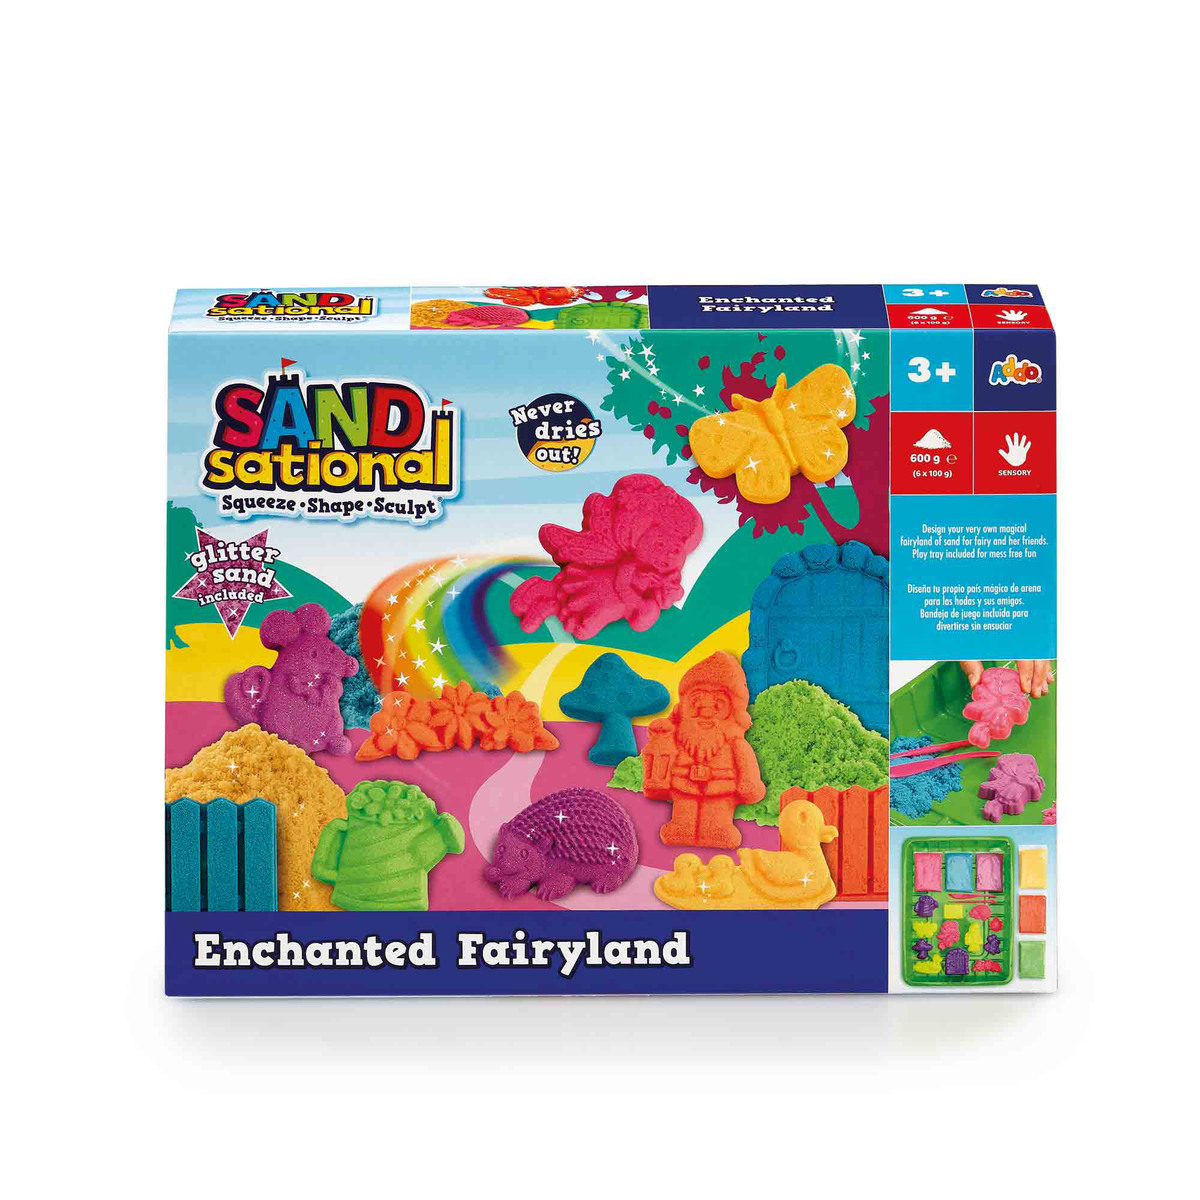 Sandsational Enchanted Fairyland Playset